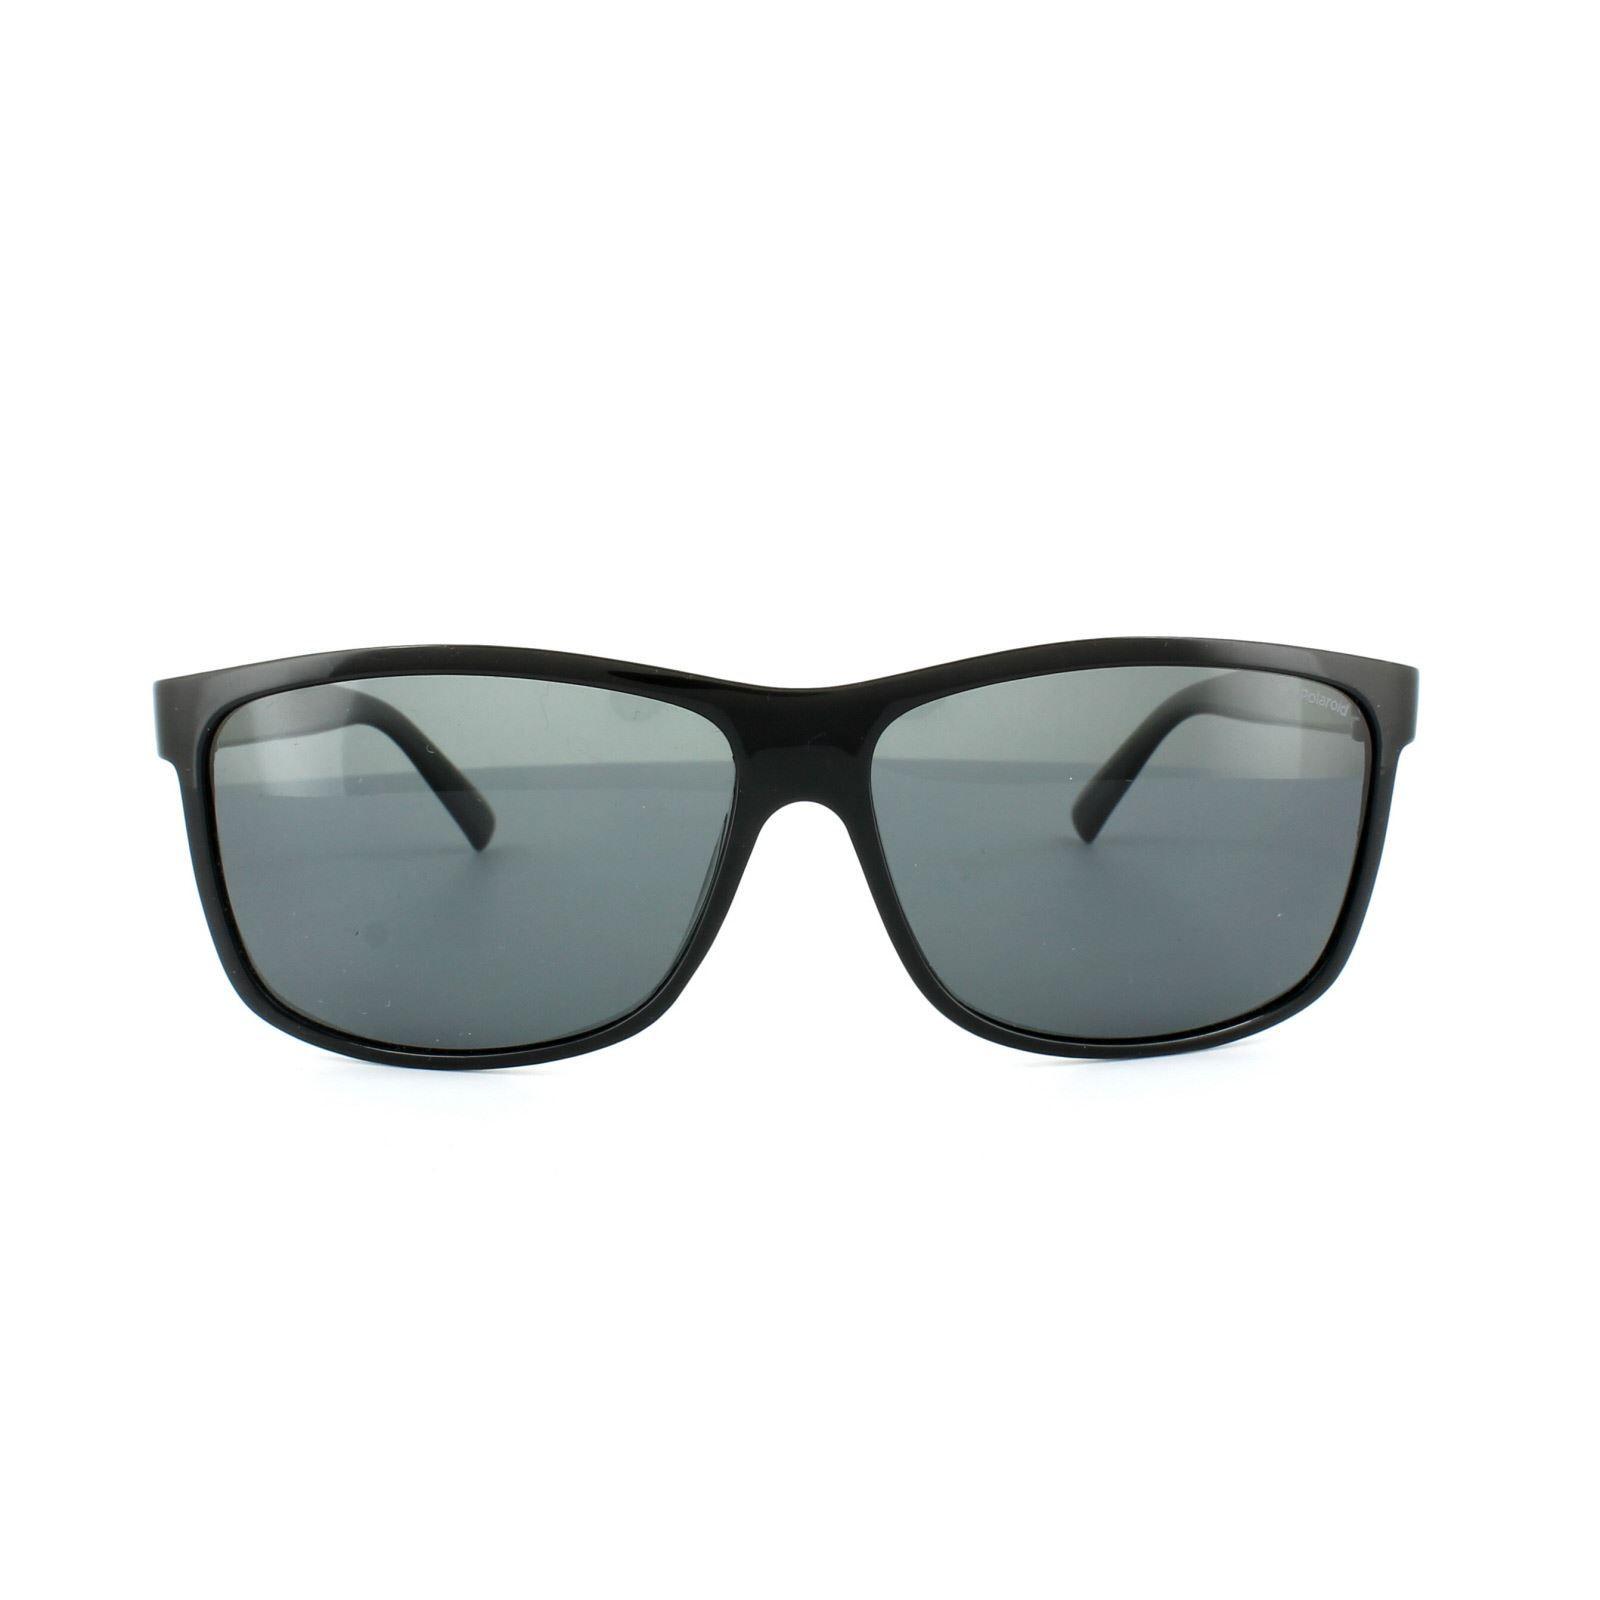 Polaroid Sunglasses 3010/S D28 Y2 Black Grey Polarized